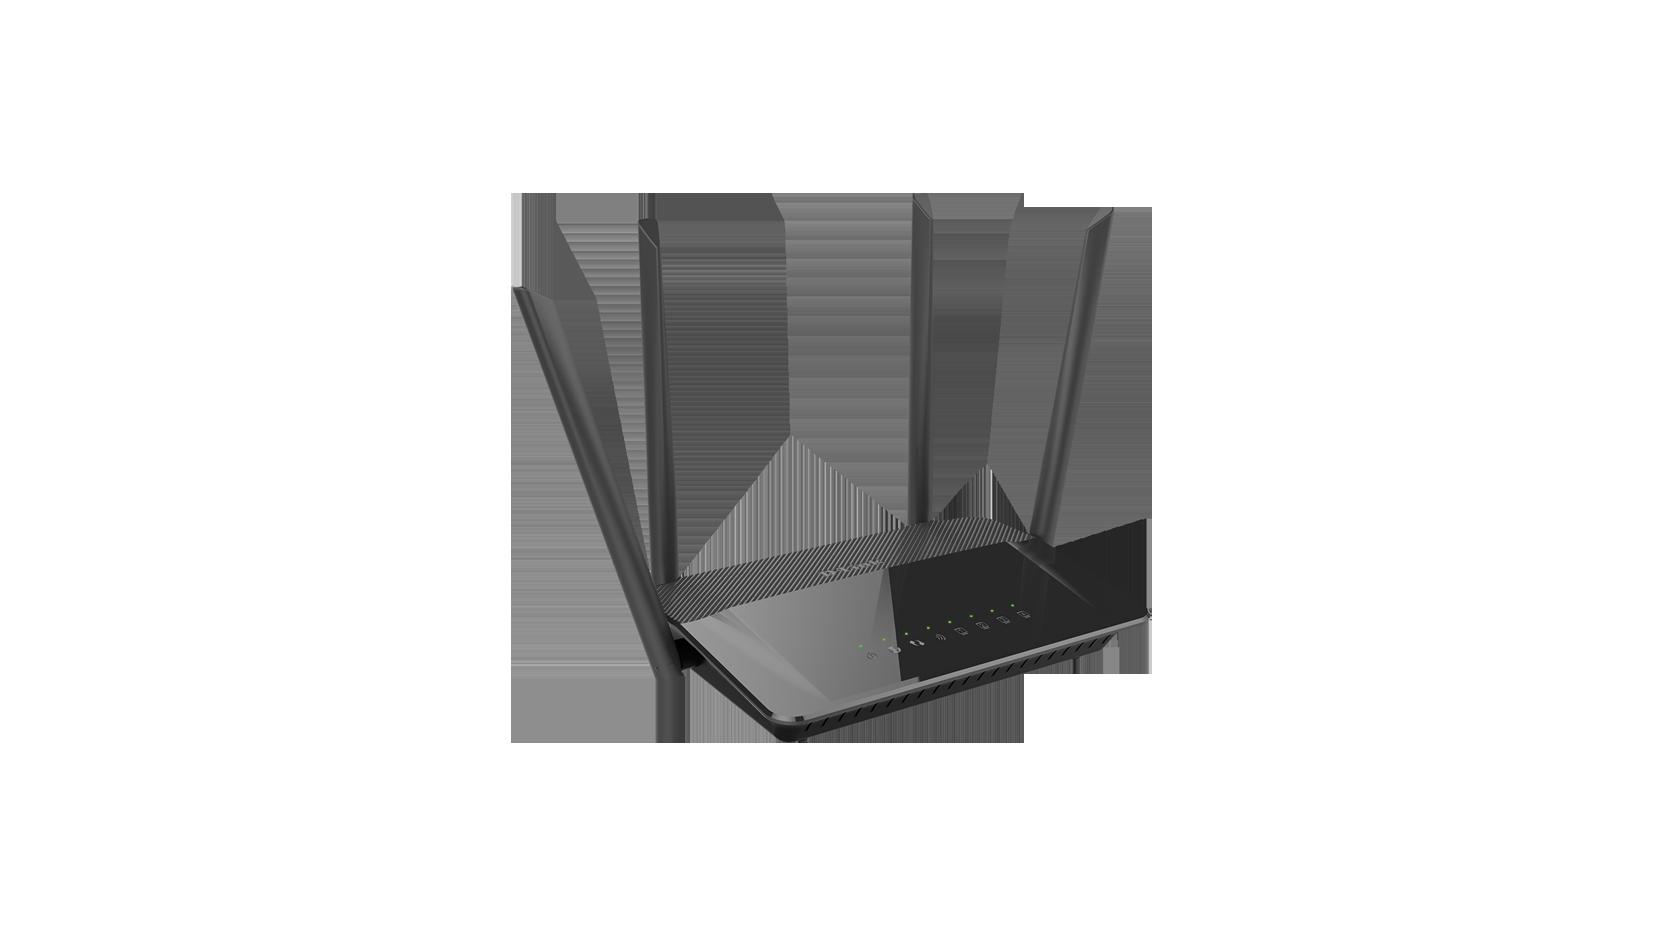 D-Link DIR-816L revB1 Router 64 BIT